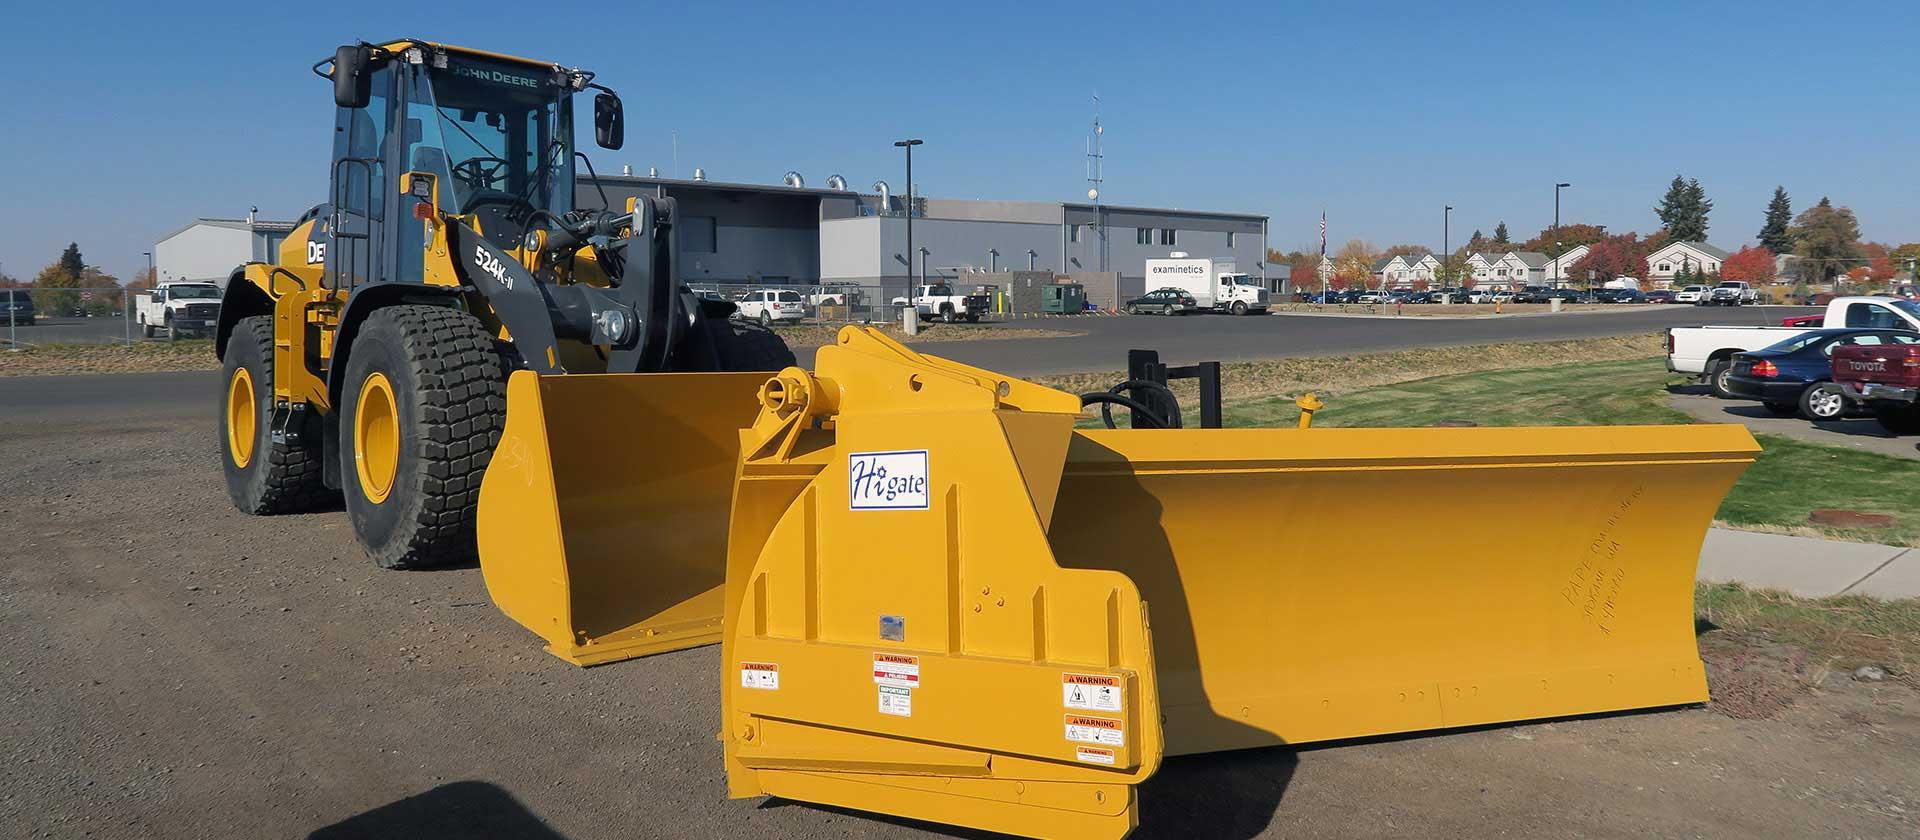 buckeye hardwood floor supply of city of spokane washington intended for snow plow with gate